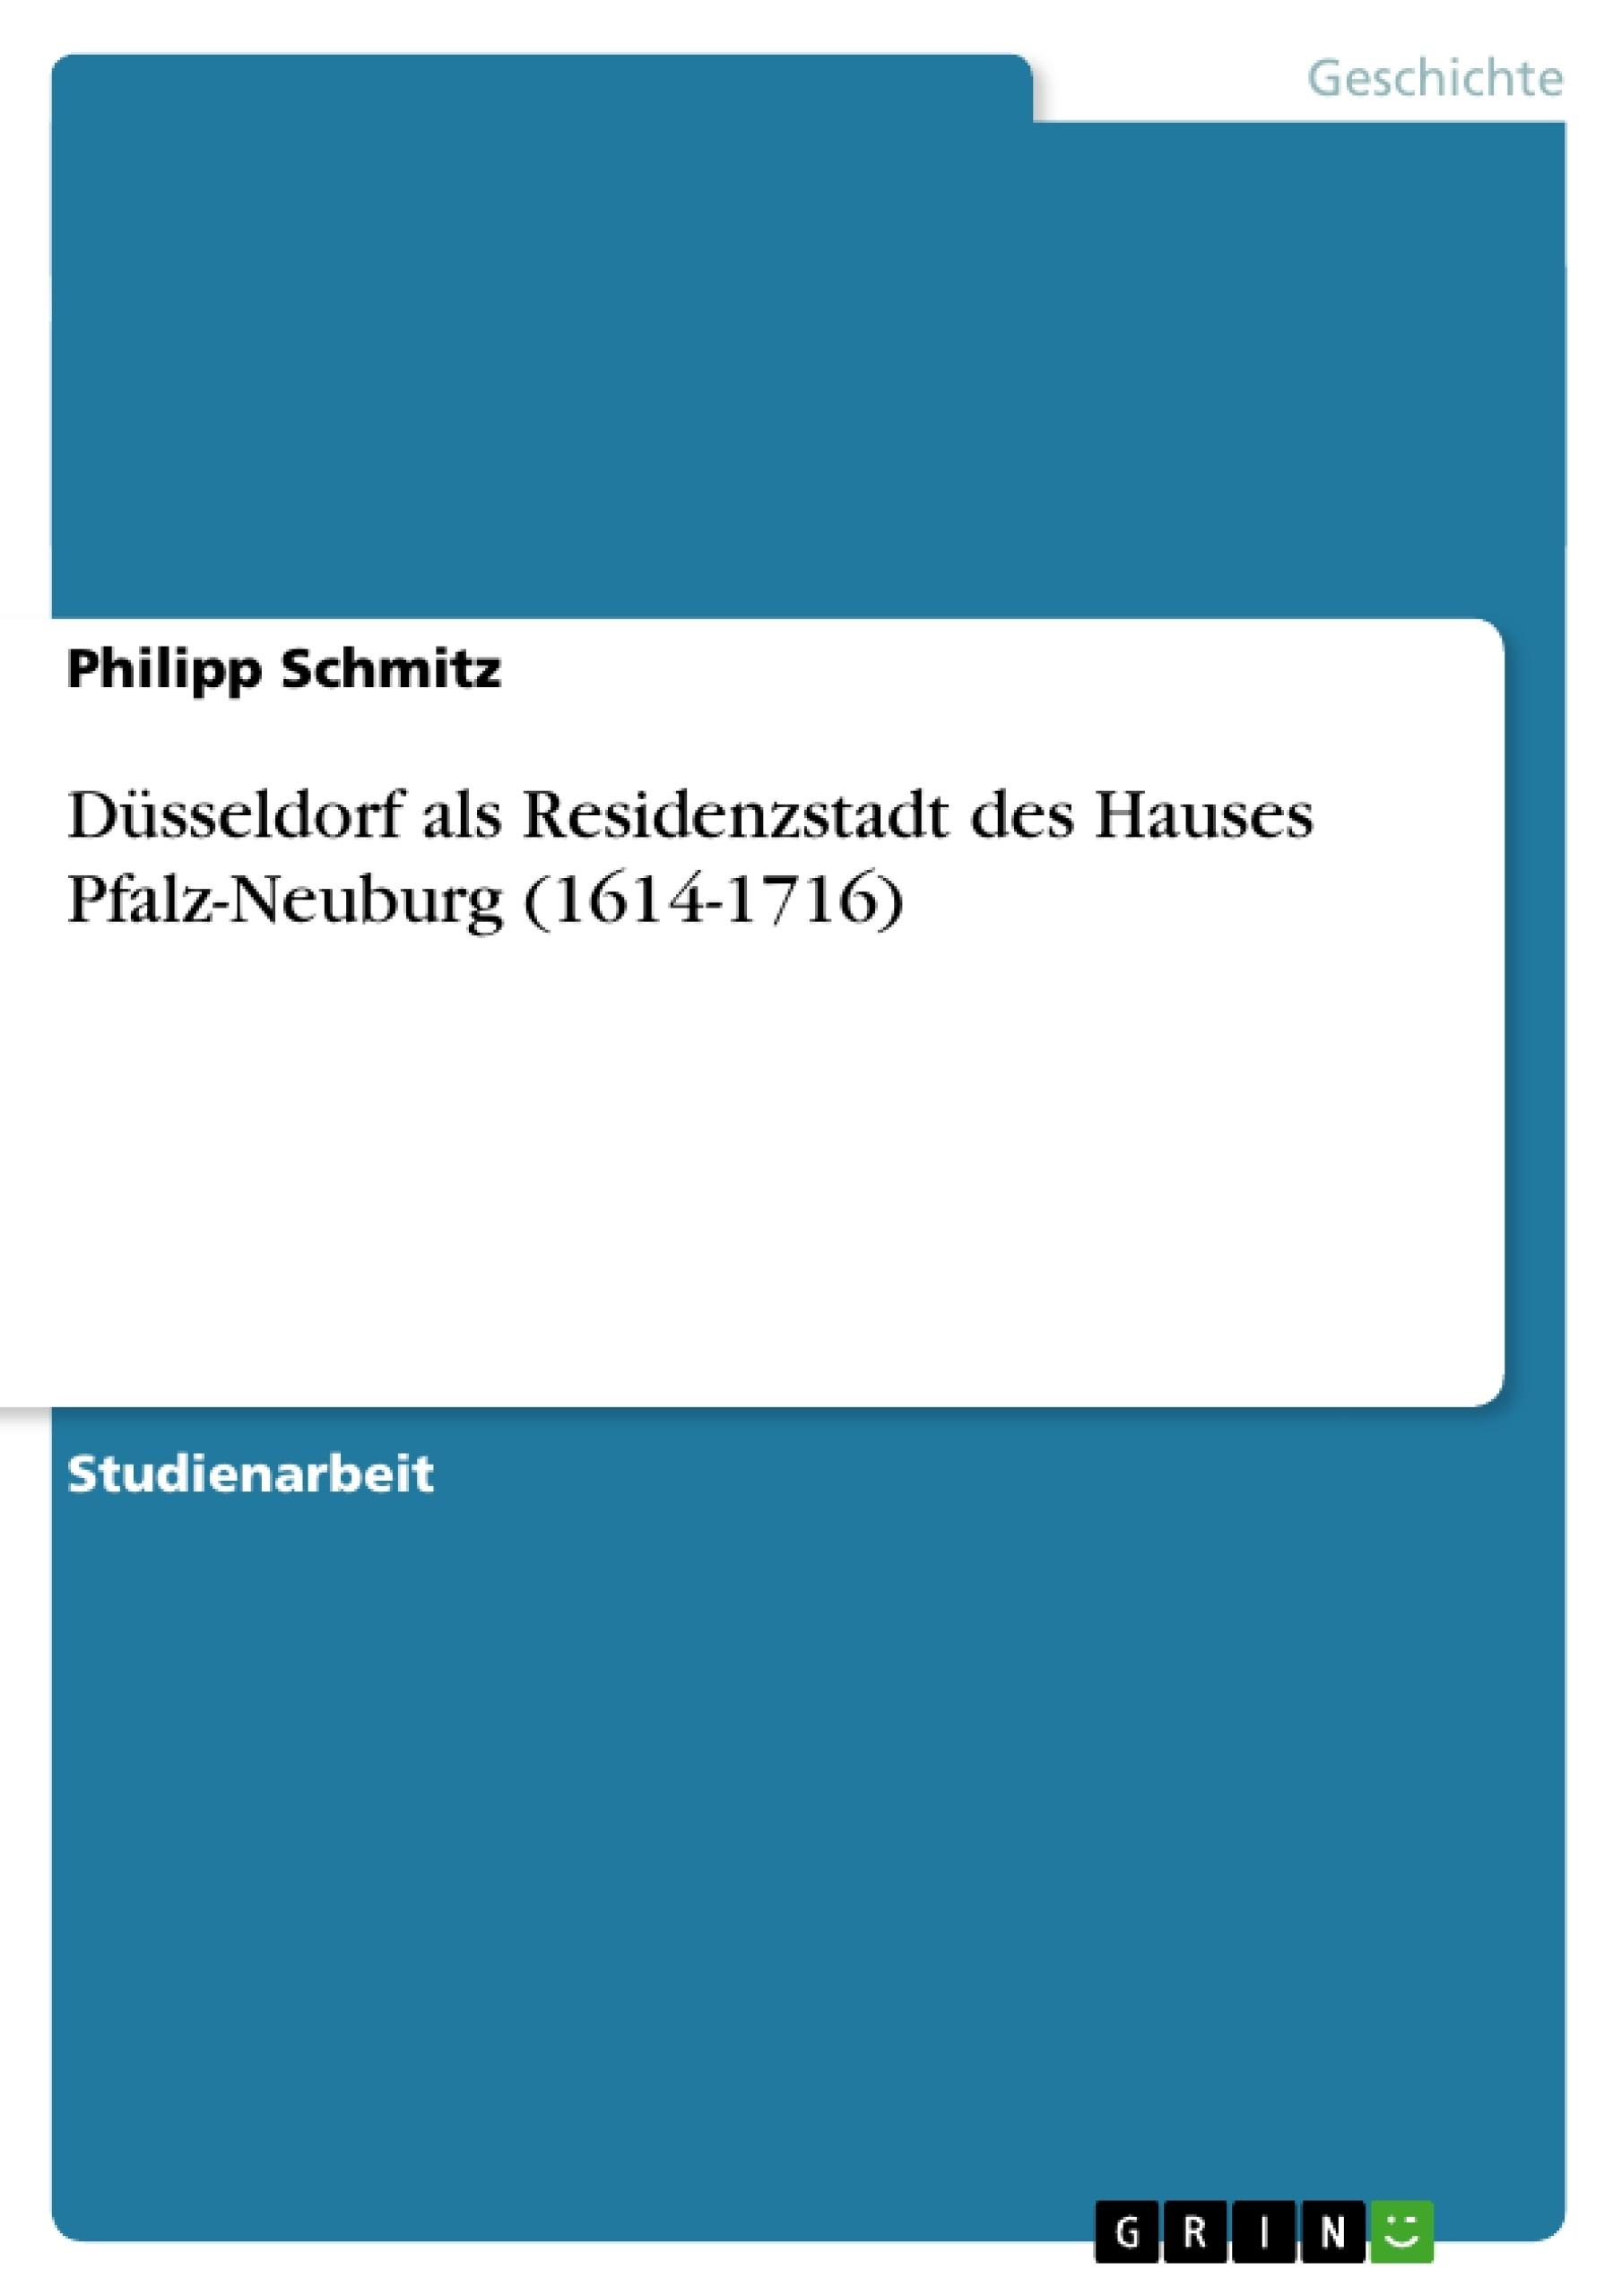 Titel: Düsseldorf als Residenzstadt des Hauses Pfalz-Neuburg (1614-1716)